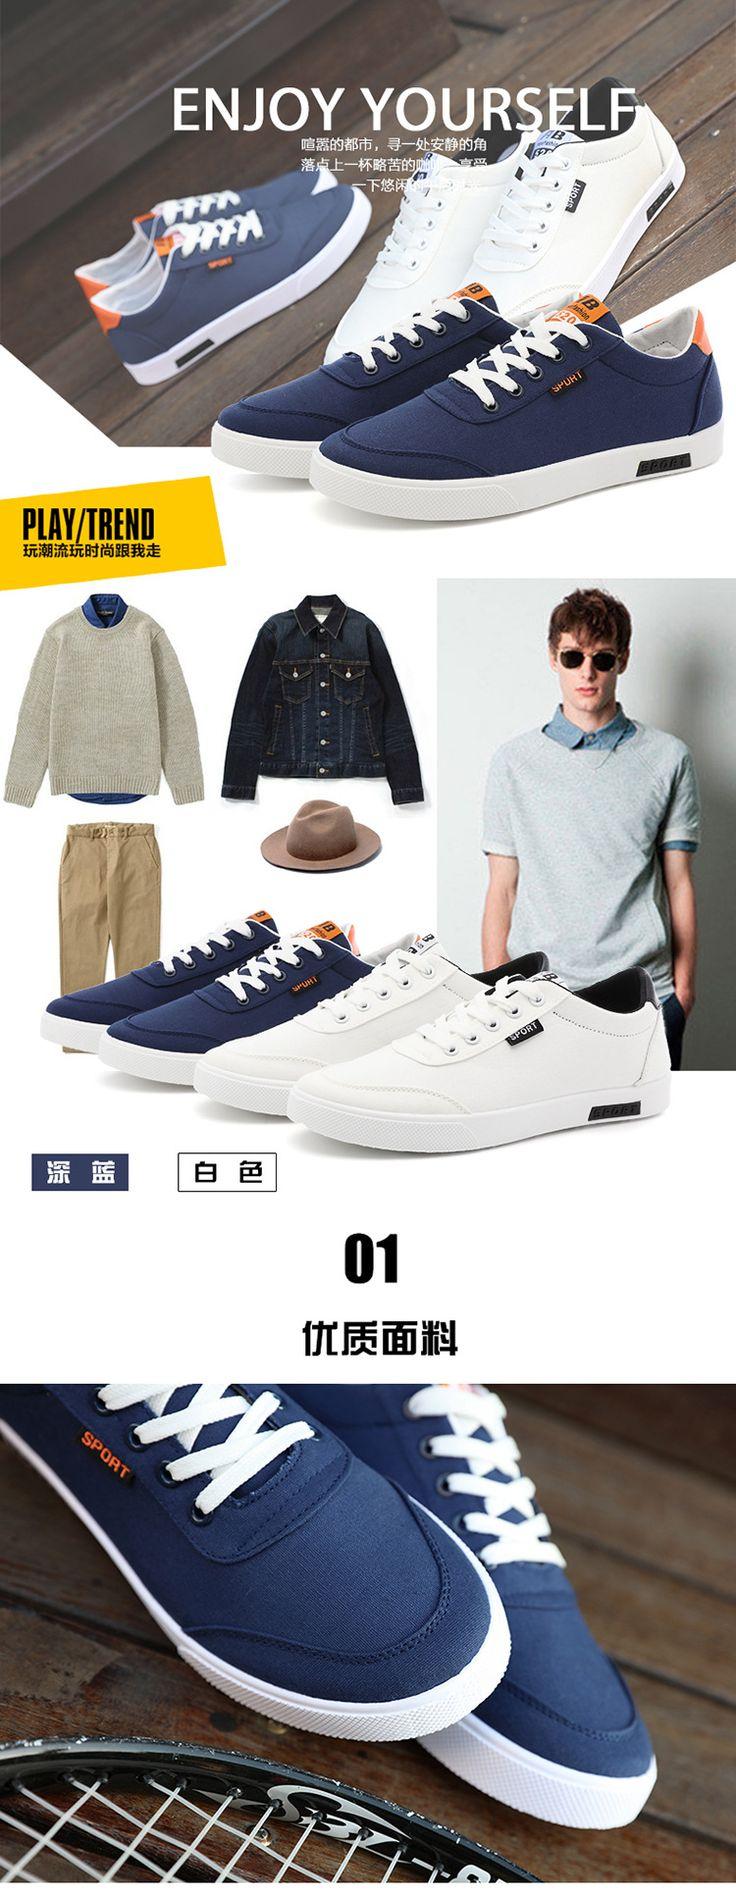 11 Best At Images On Pinterest Shirt Blouses Blouse And Korea Style Minimal Cover Up Batwing Top Light Camel Putih Xl Joy Korean Fashion Men Canvas Shoes Black Intl